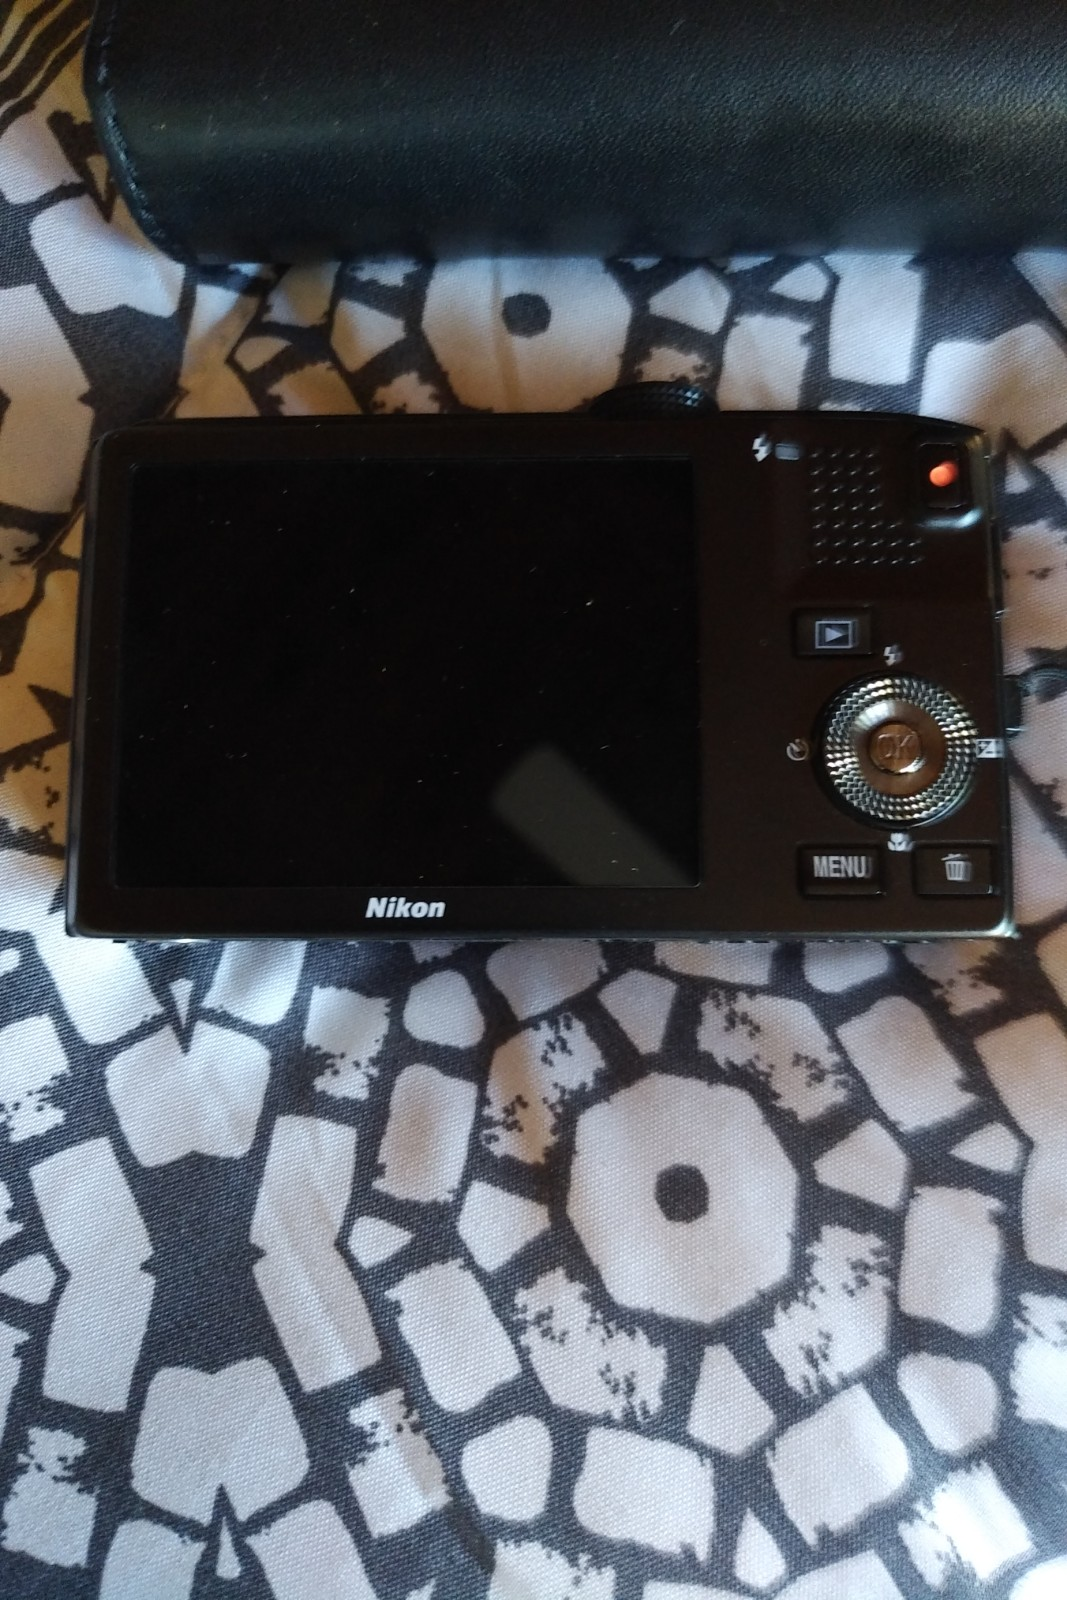 Nikon Coolpix camera S8100